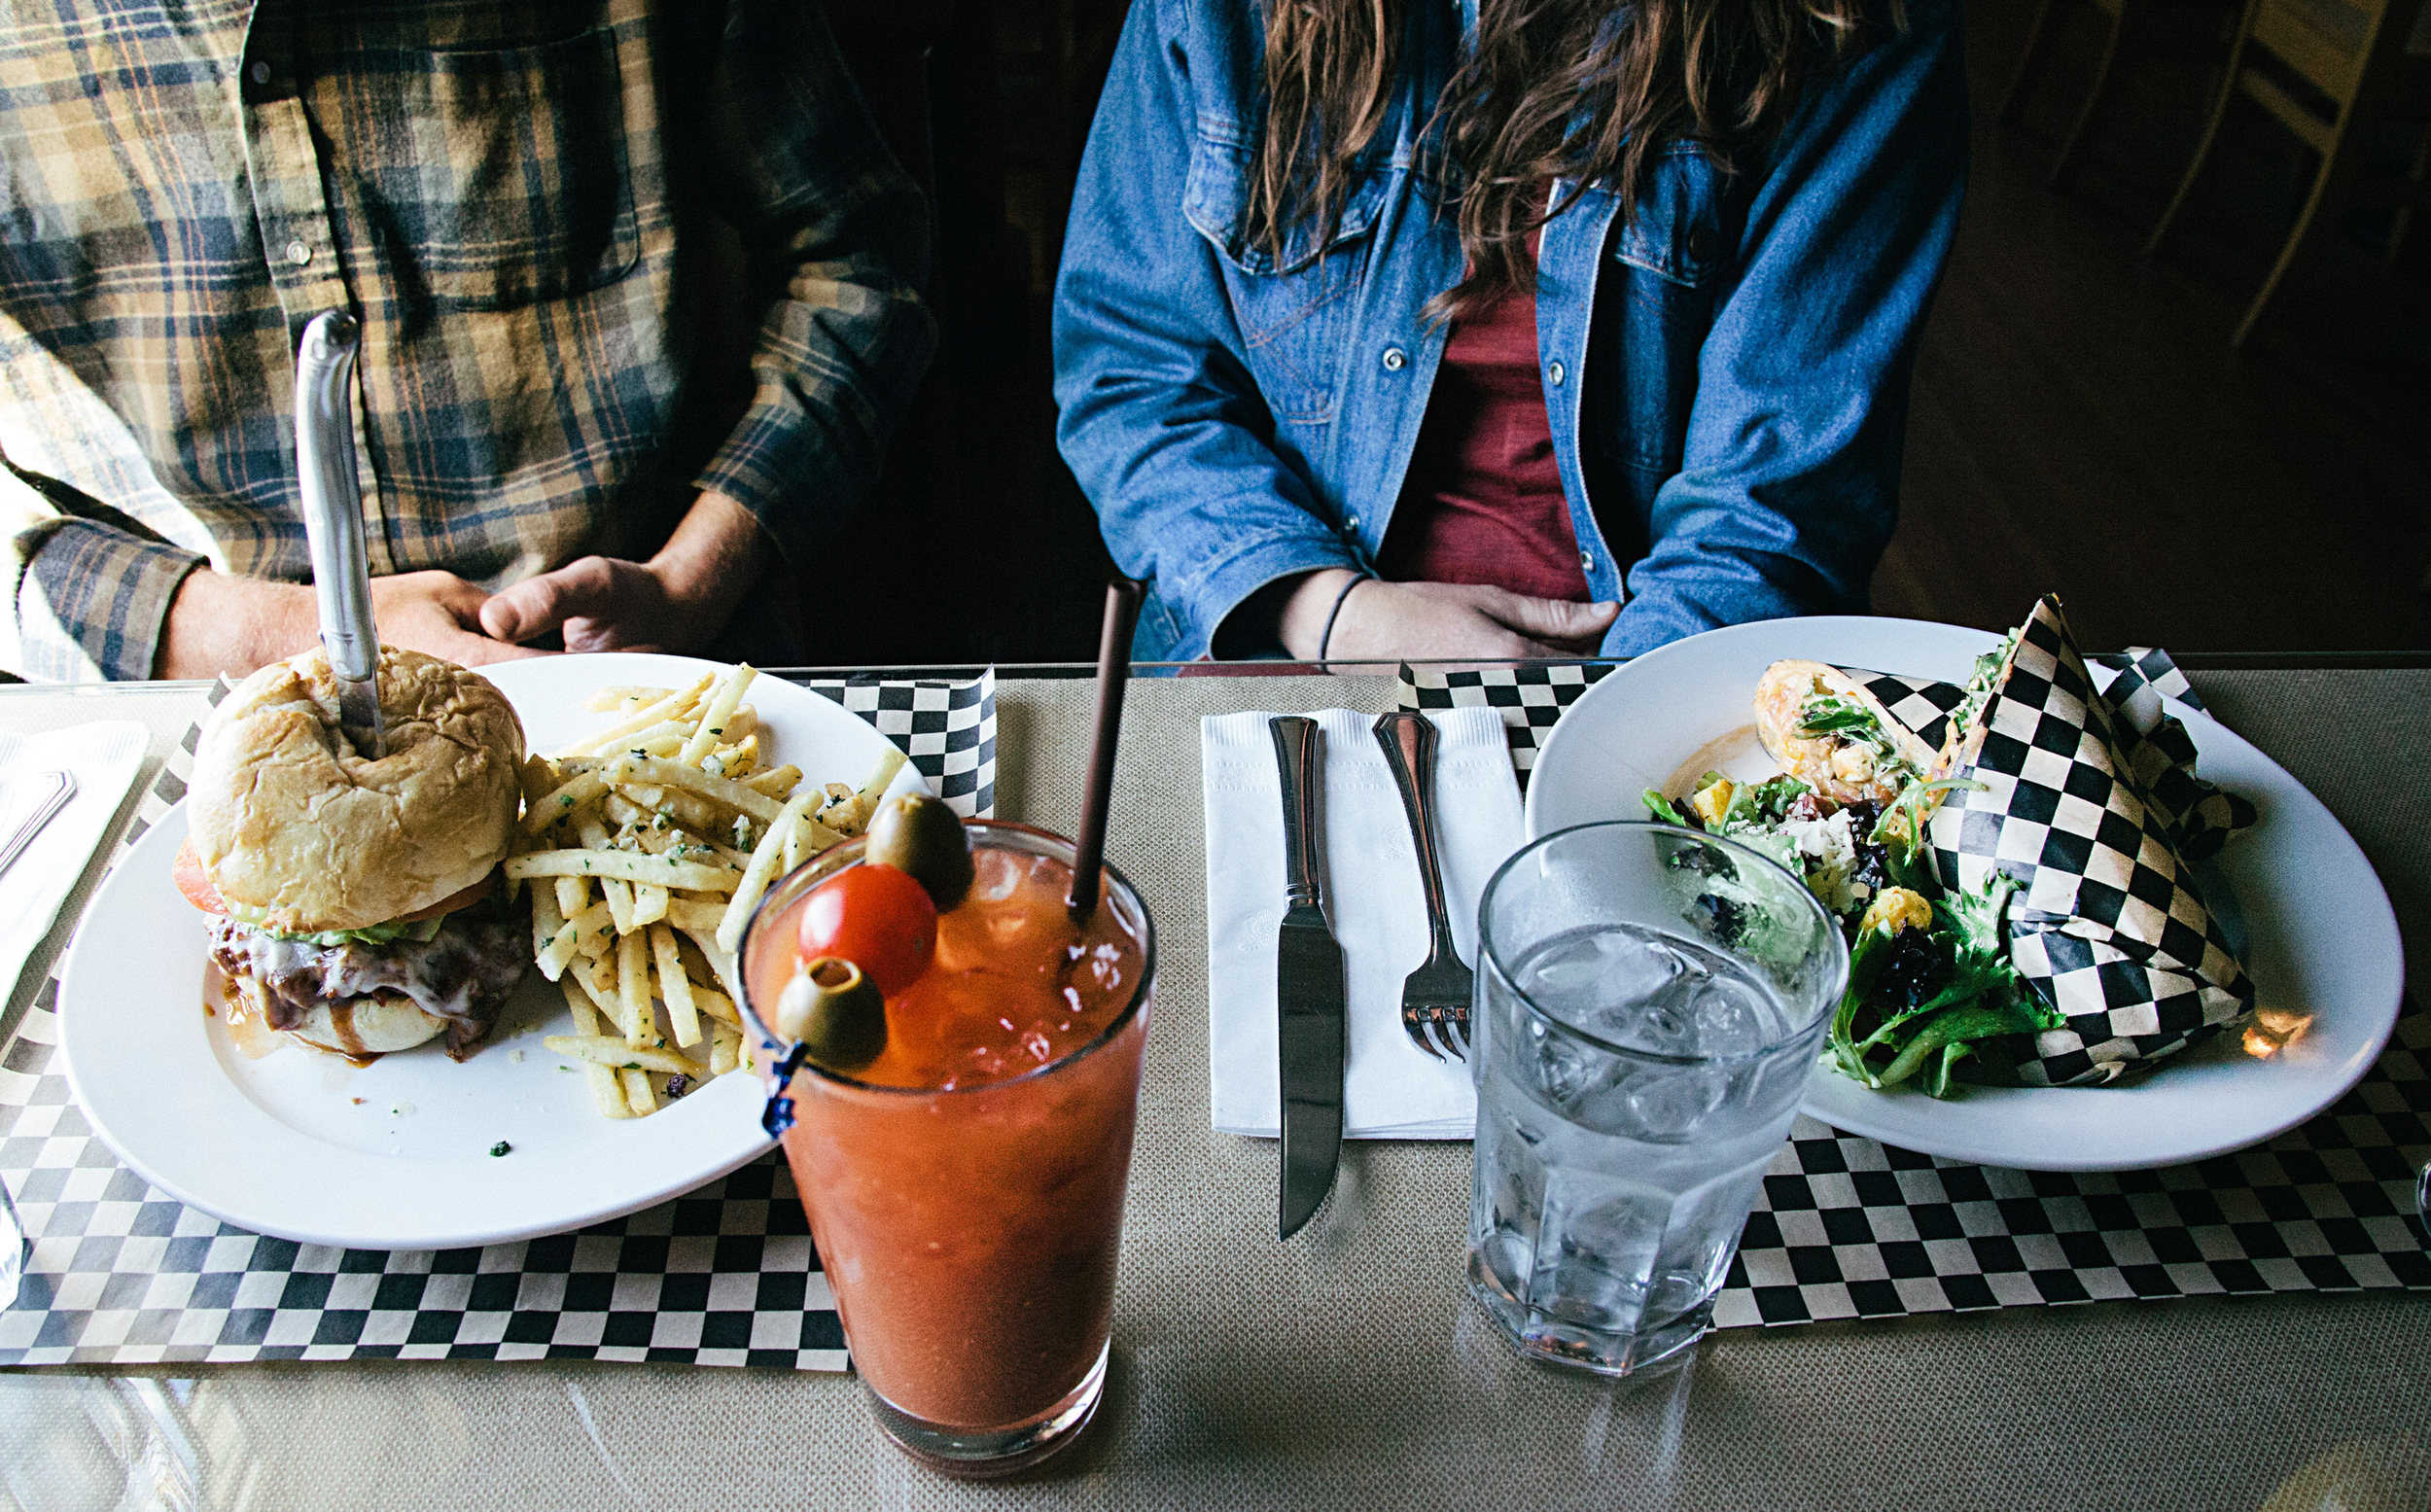 cottonwood-cafe-breakfast-lunch-restaurant-sisters-oregon.jpg